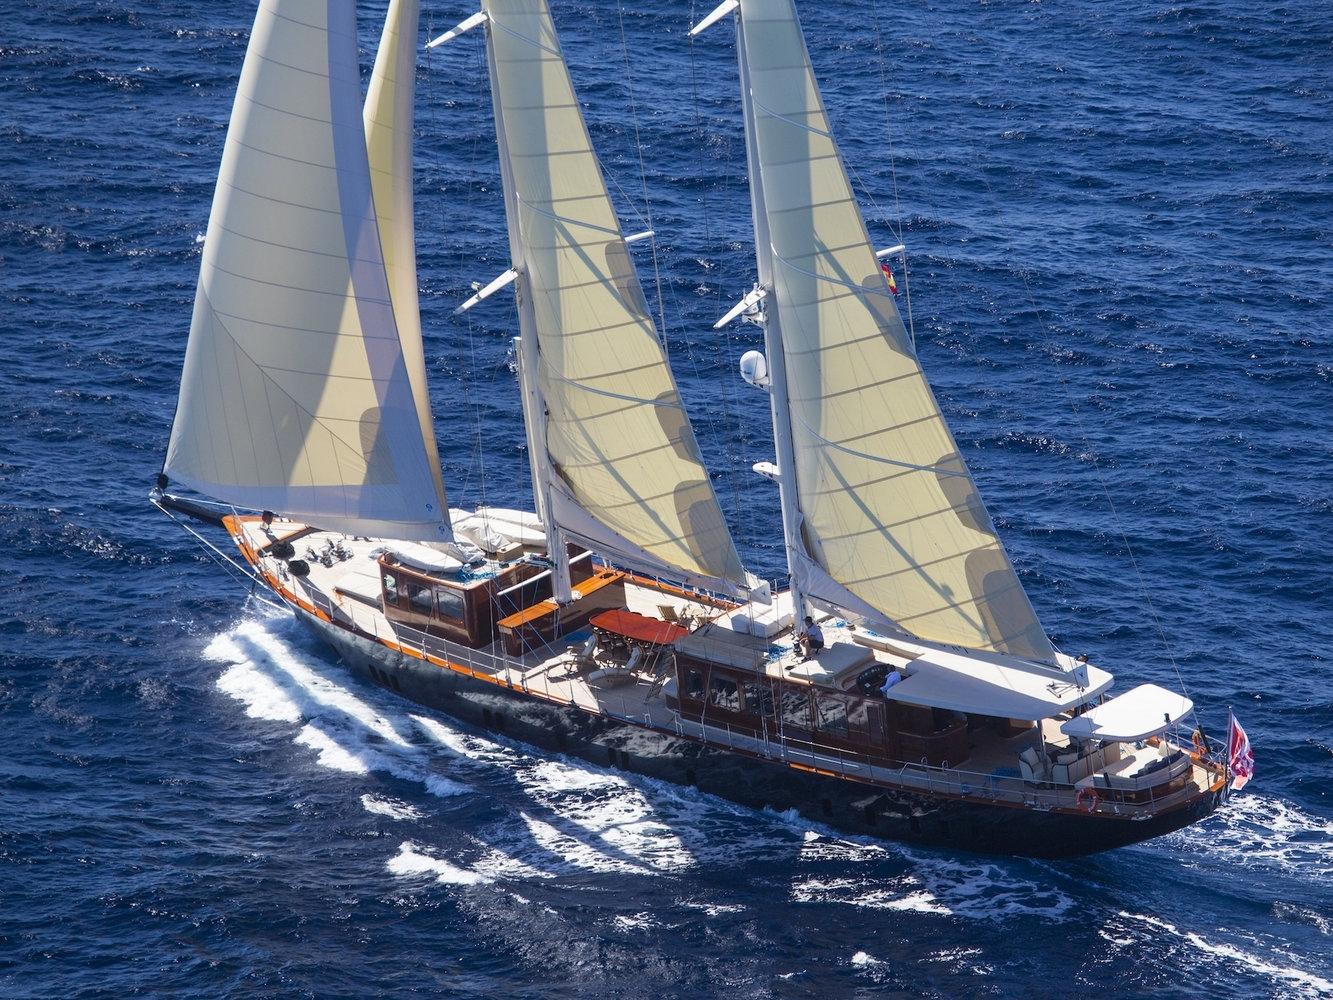 UY_yachts_profile_Satori.jpg